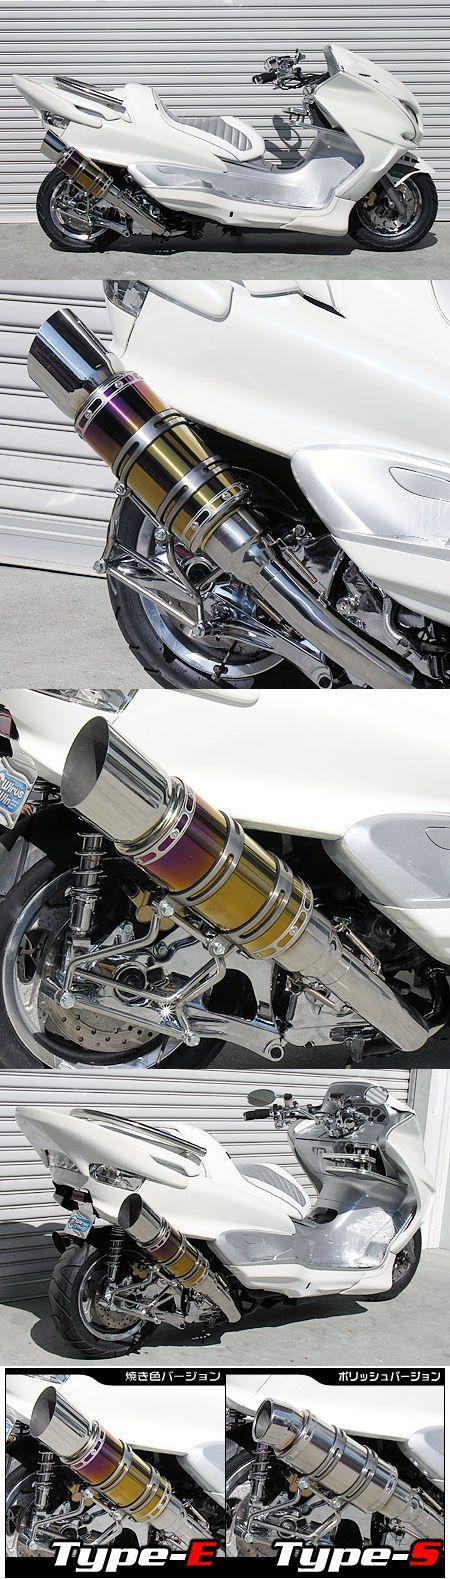 Beast短版全段排氣管 TYPE E 燒色重低音版 附觸媒 (排氣淨化觸媒)